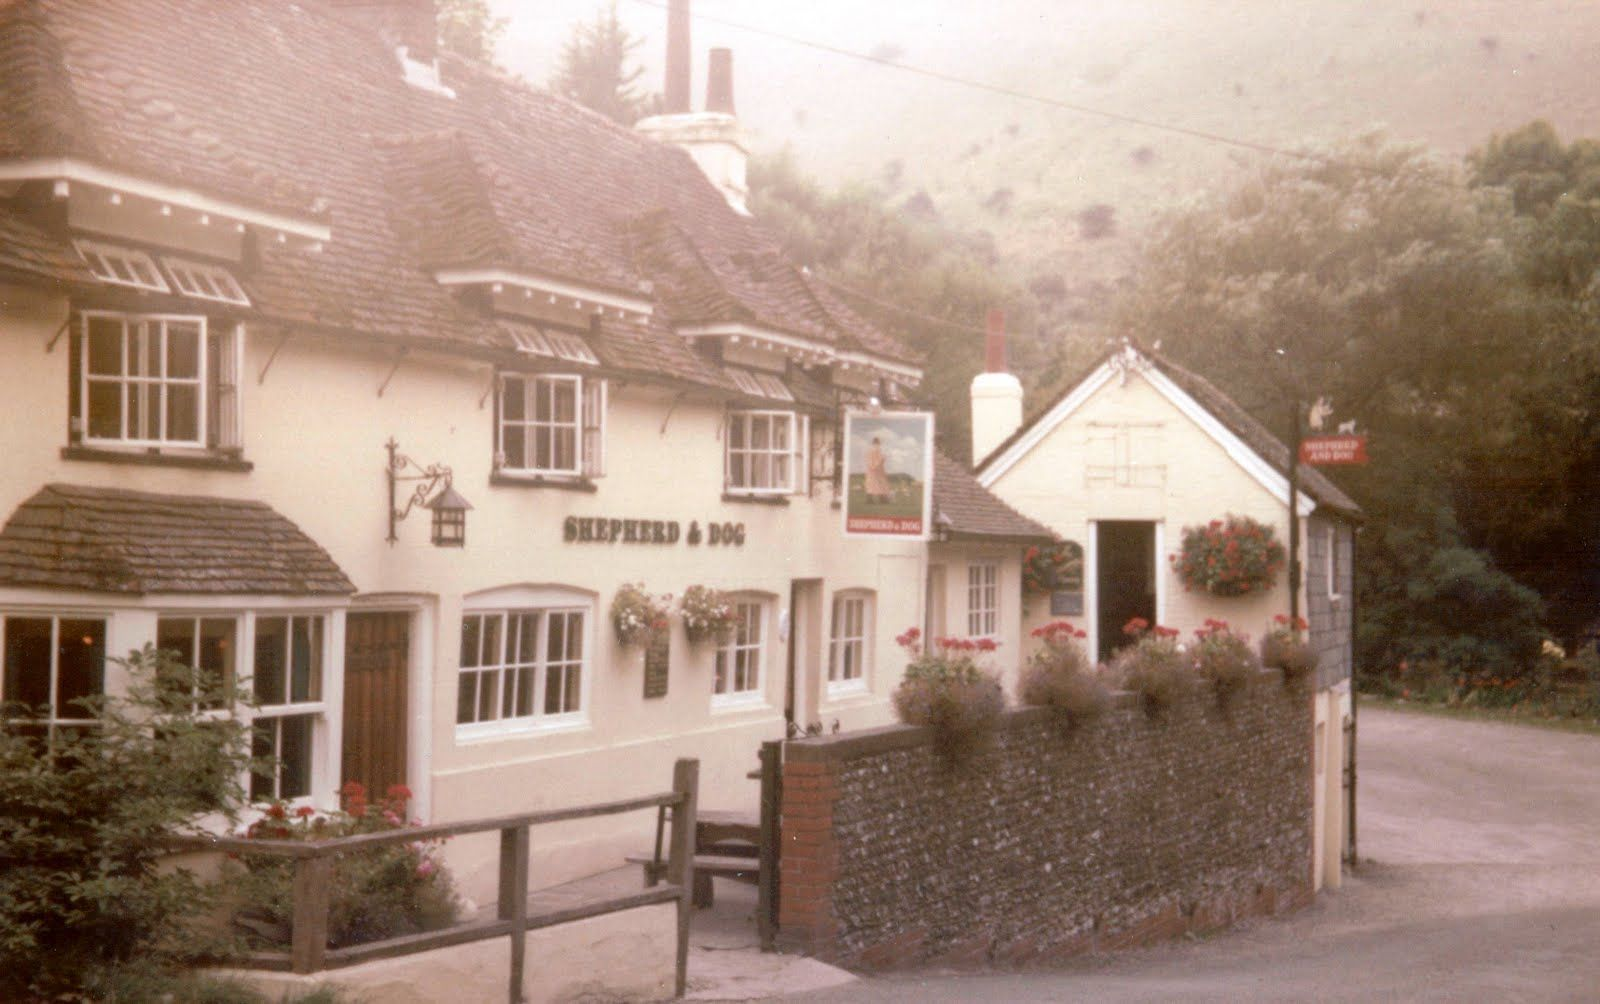 45b011a4f5505cb445c5f7bc82409e89 - Pubs In West Sussex With Gardens